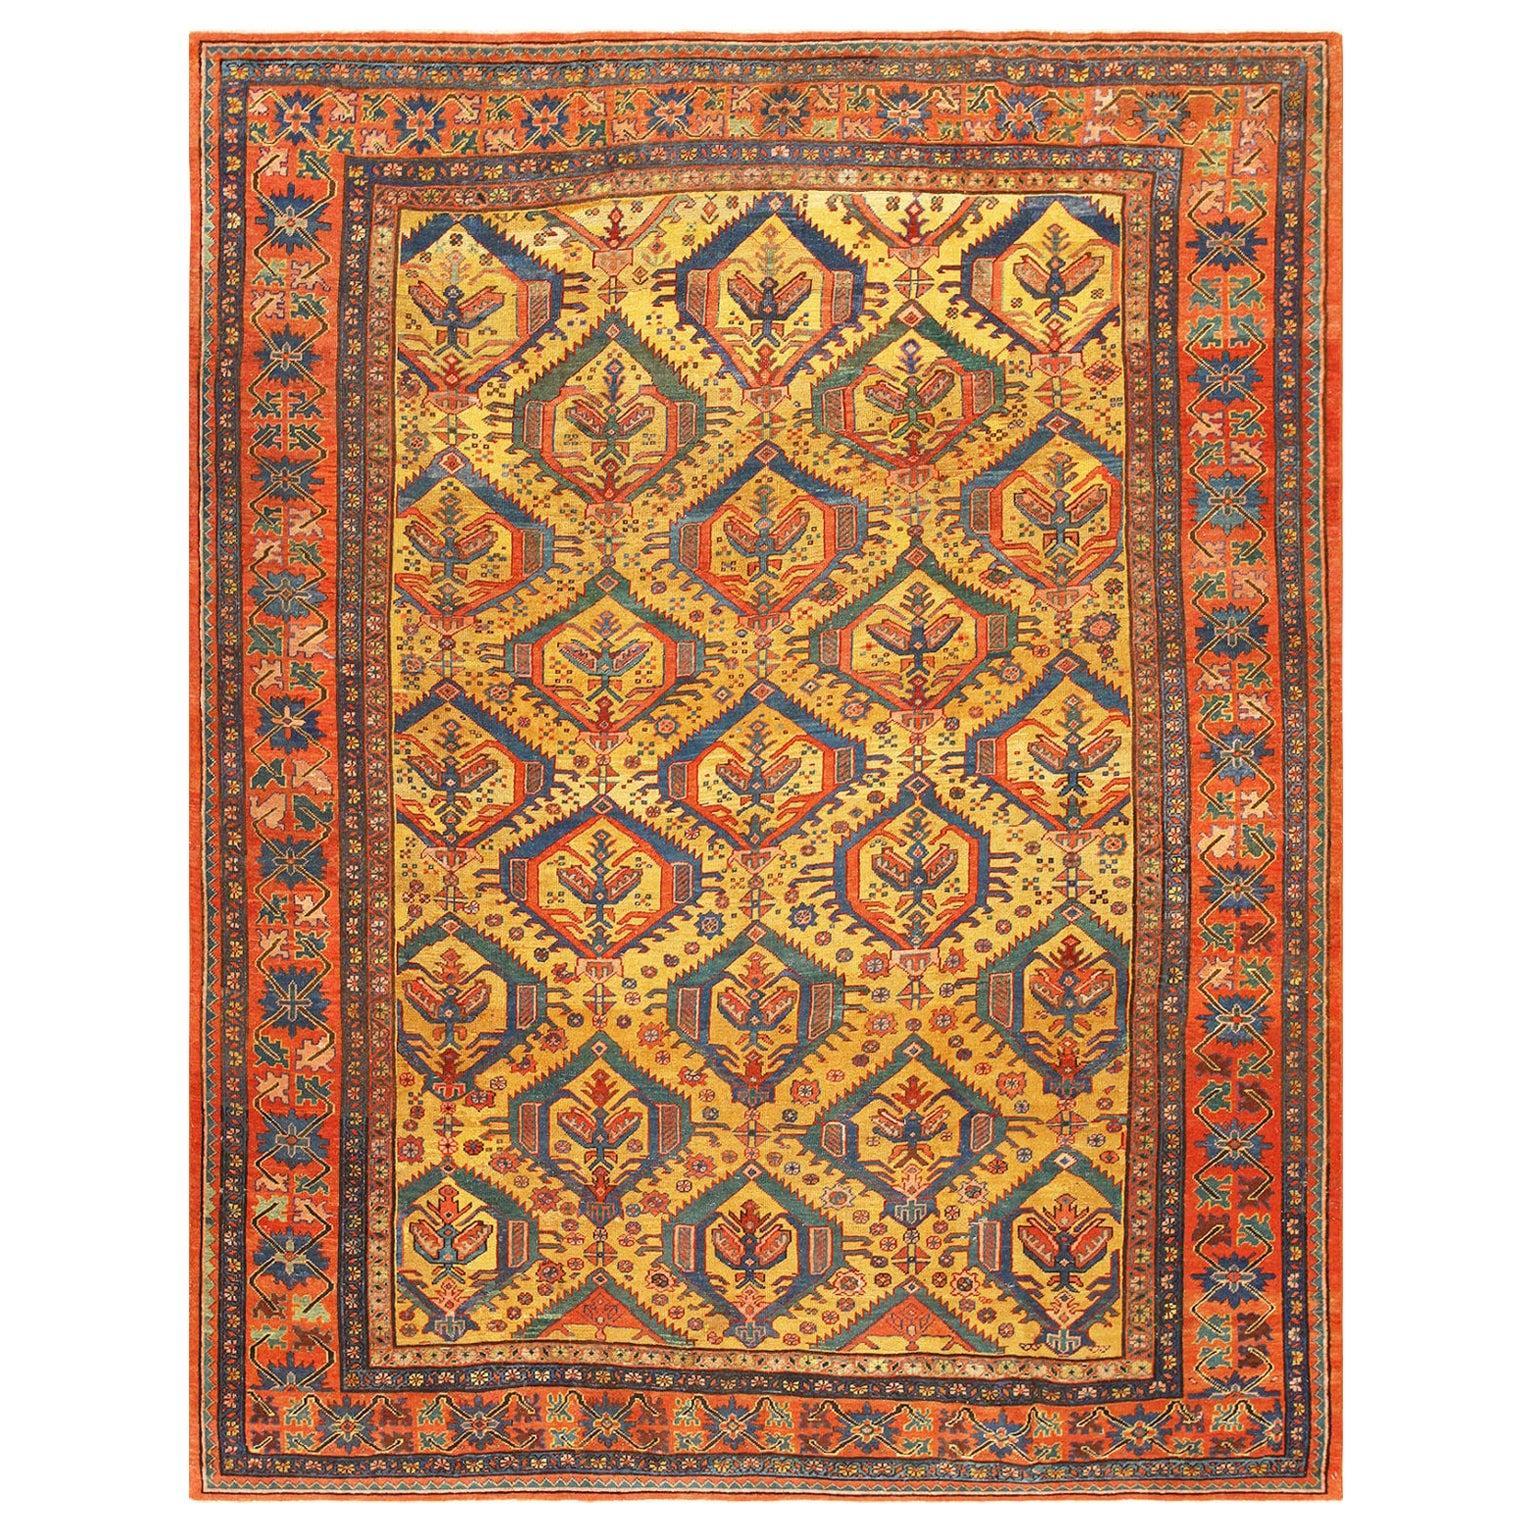 "Tribal Gold Background Antique Persian Bakshaish Rug. Size: 8' 6"" x 10' 8"""